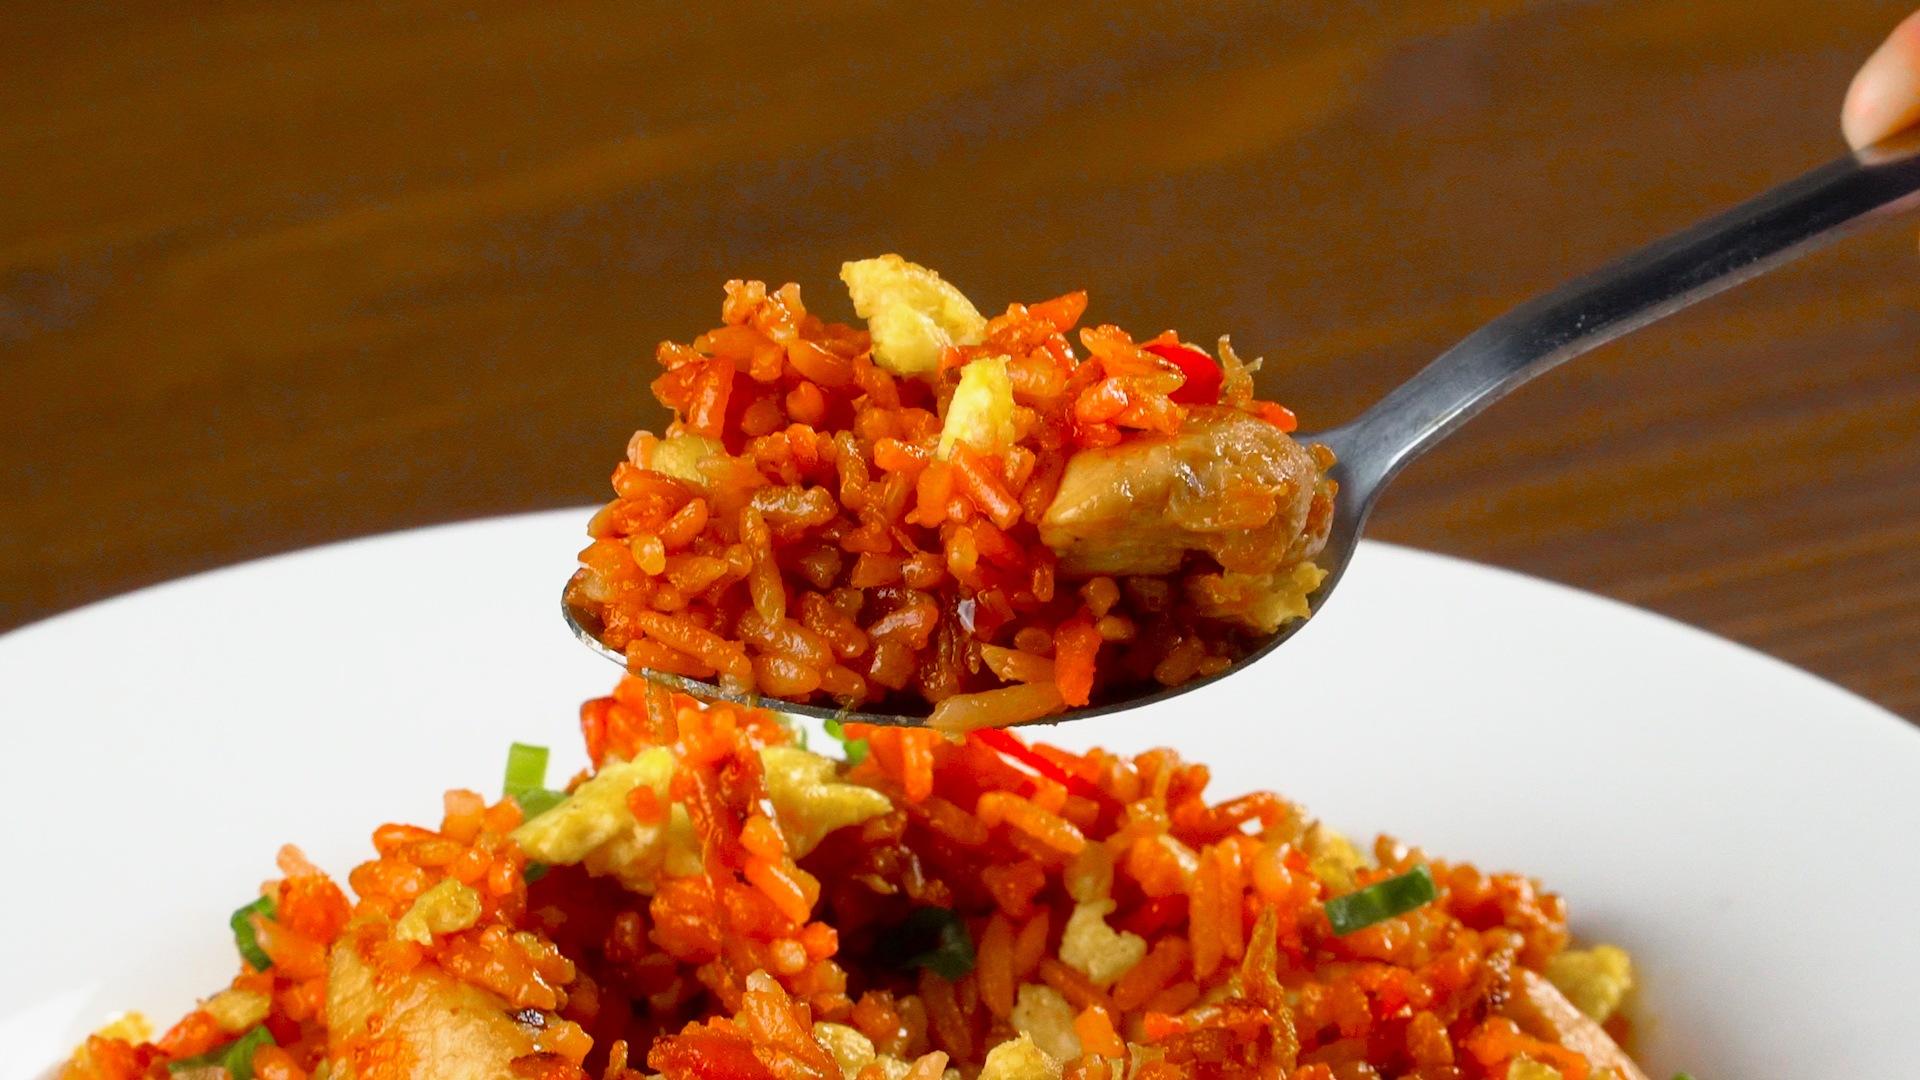 Resep Nasi Goreng Merah Khas Makassar - Masak Apa Hari Ini?